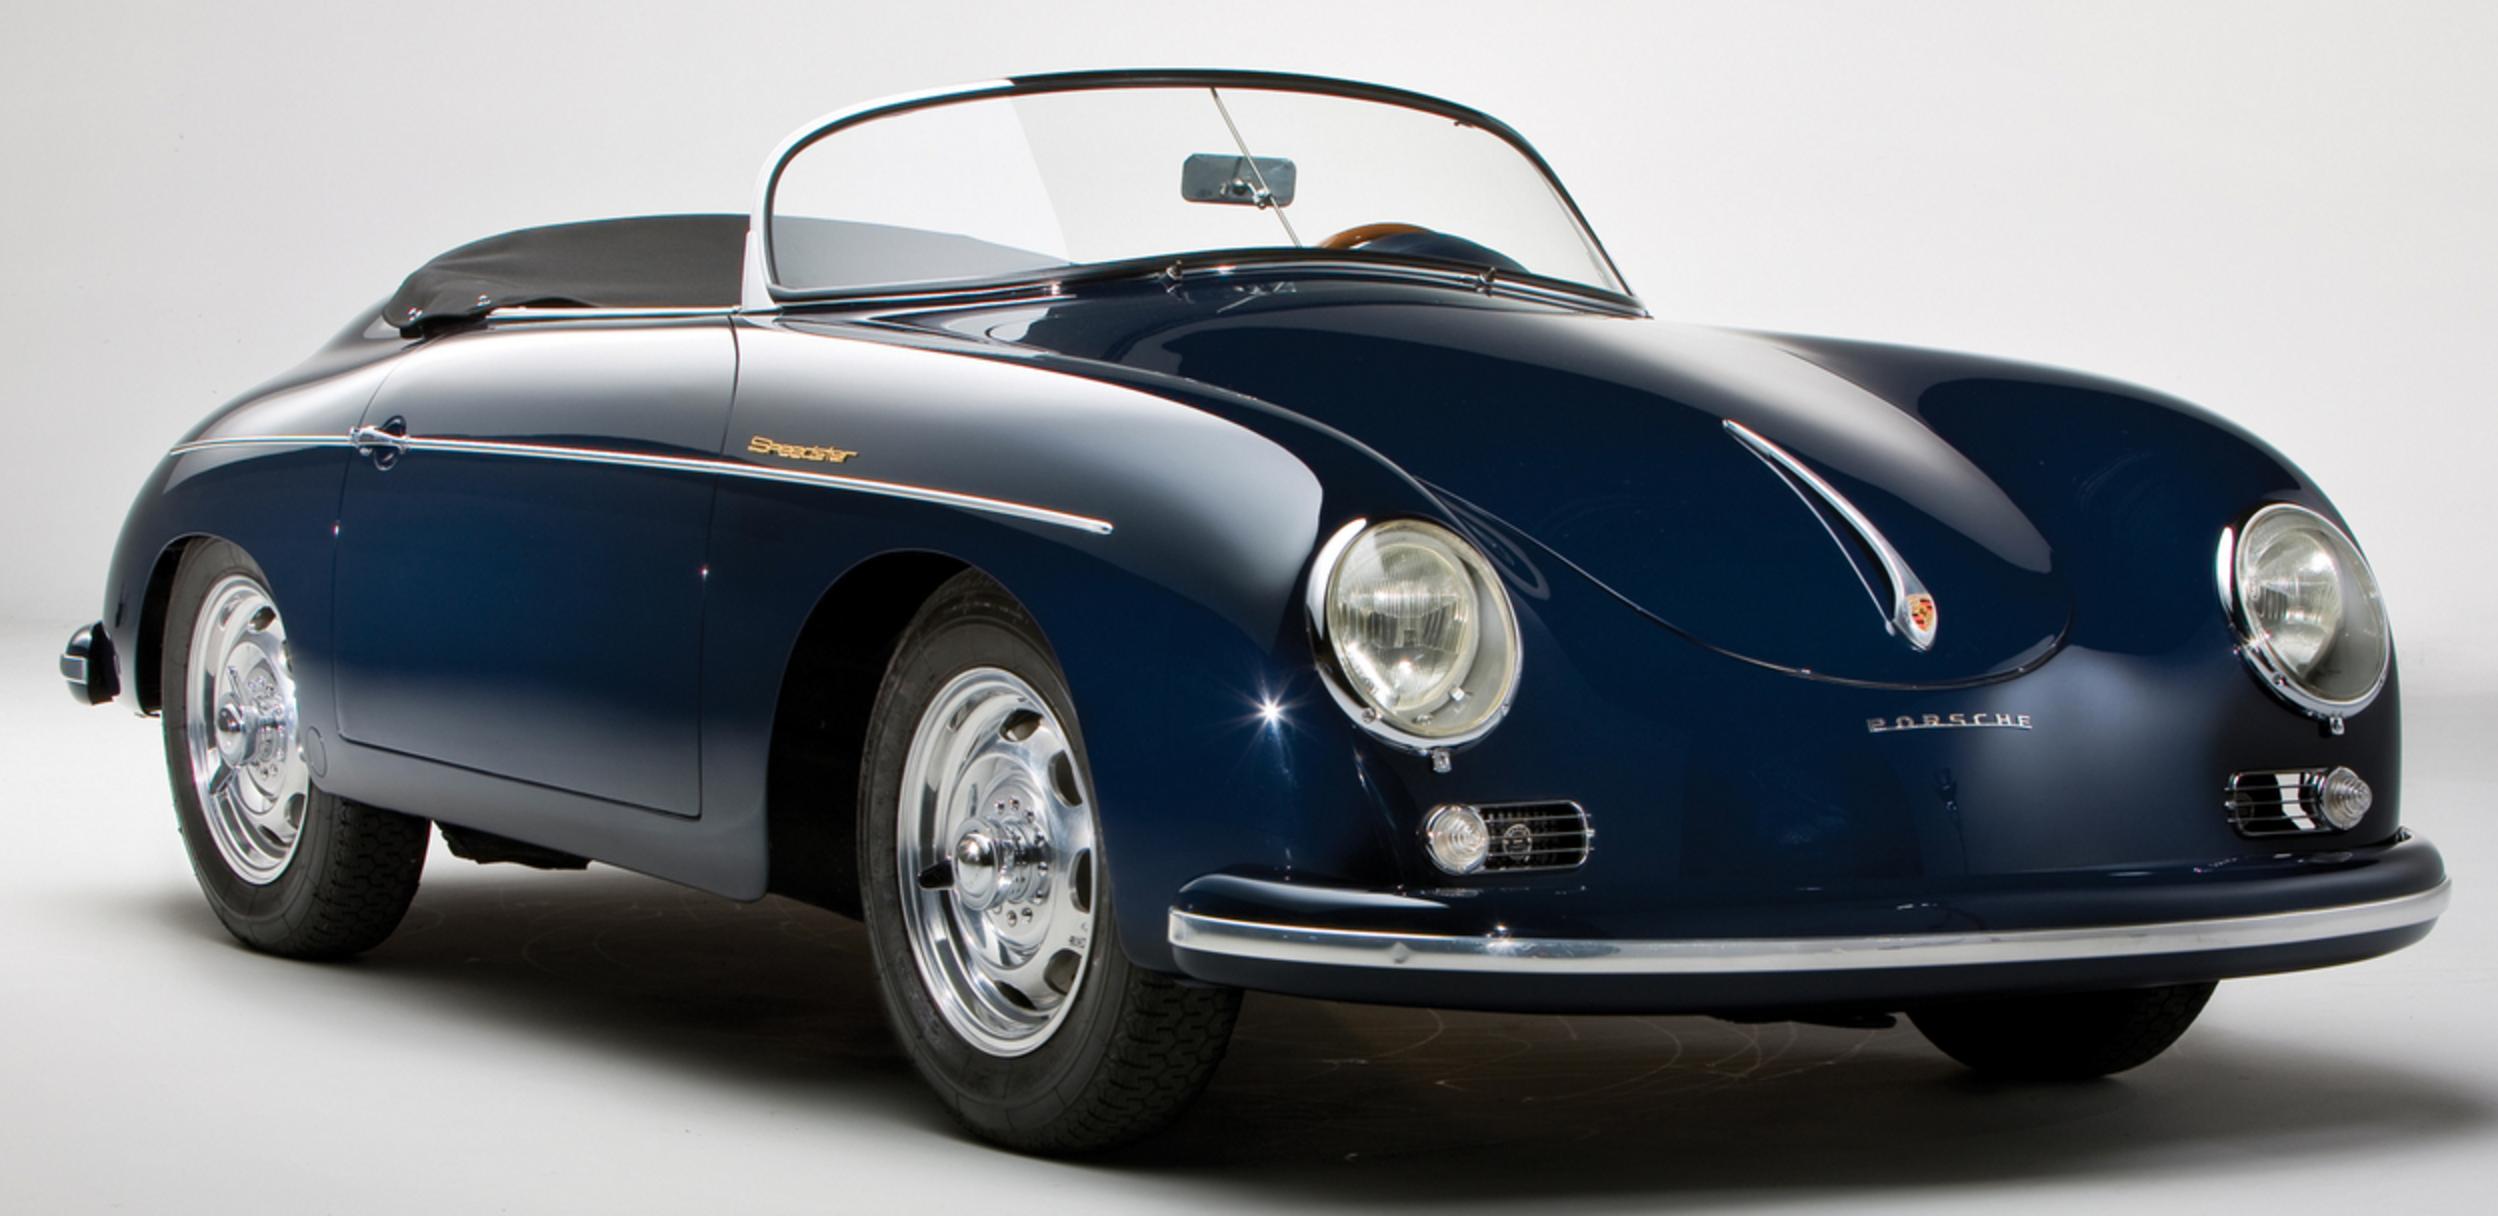 Porsche 356a 1600 Speedster 1956 1958 Porsche 356a Porsche 356 Porsche 356 Speedster